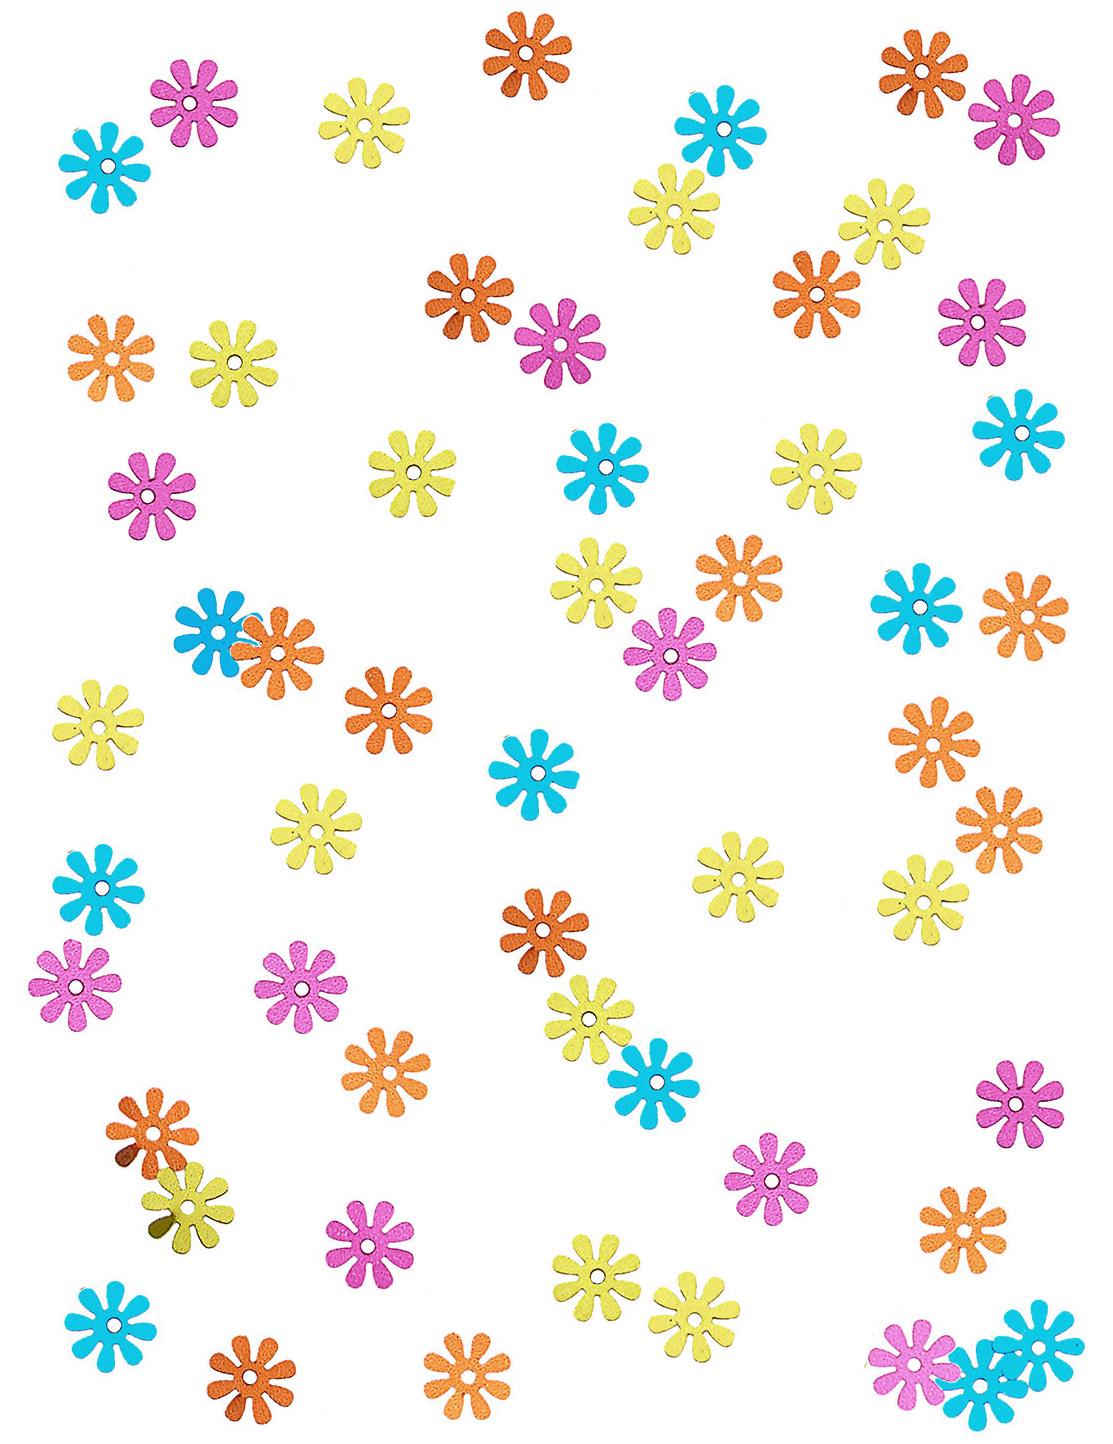 Hippie Bloemen Confetti Decoratie En Goedkope